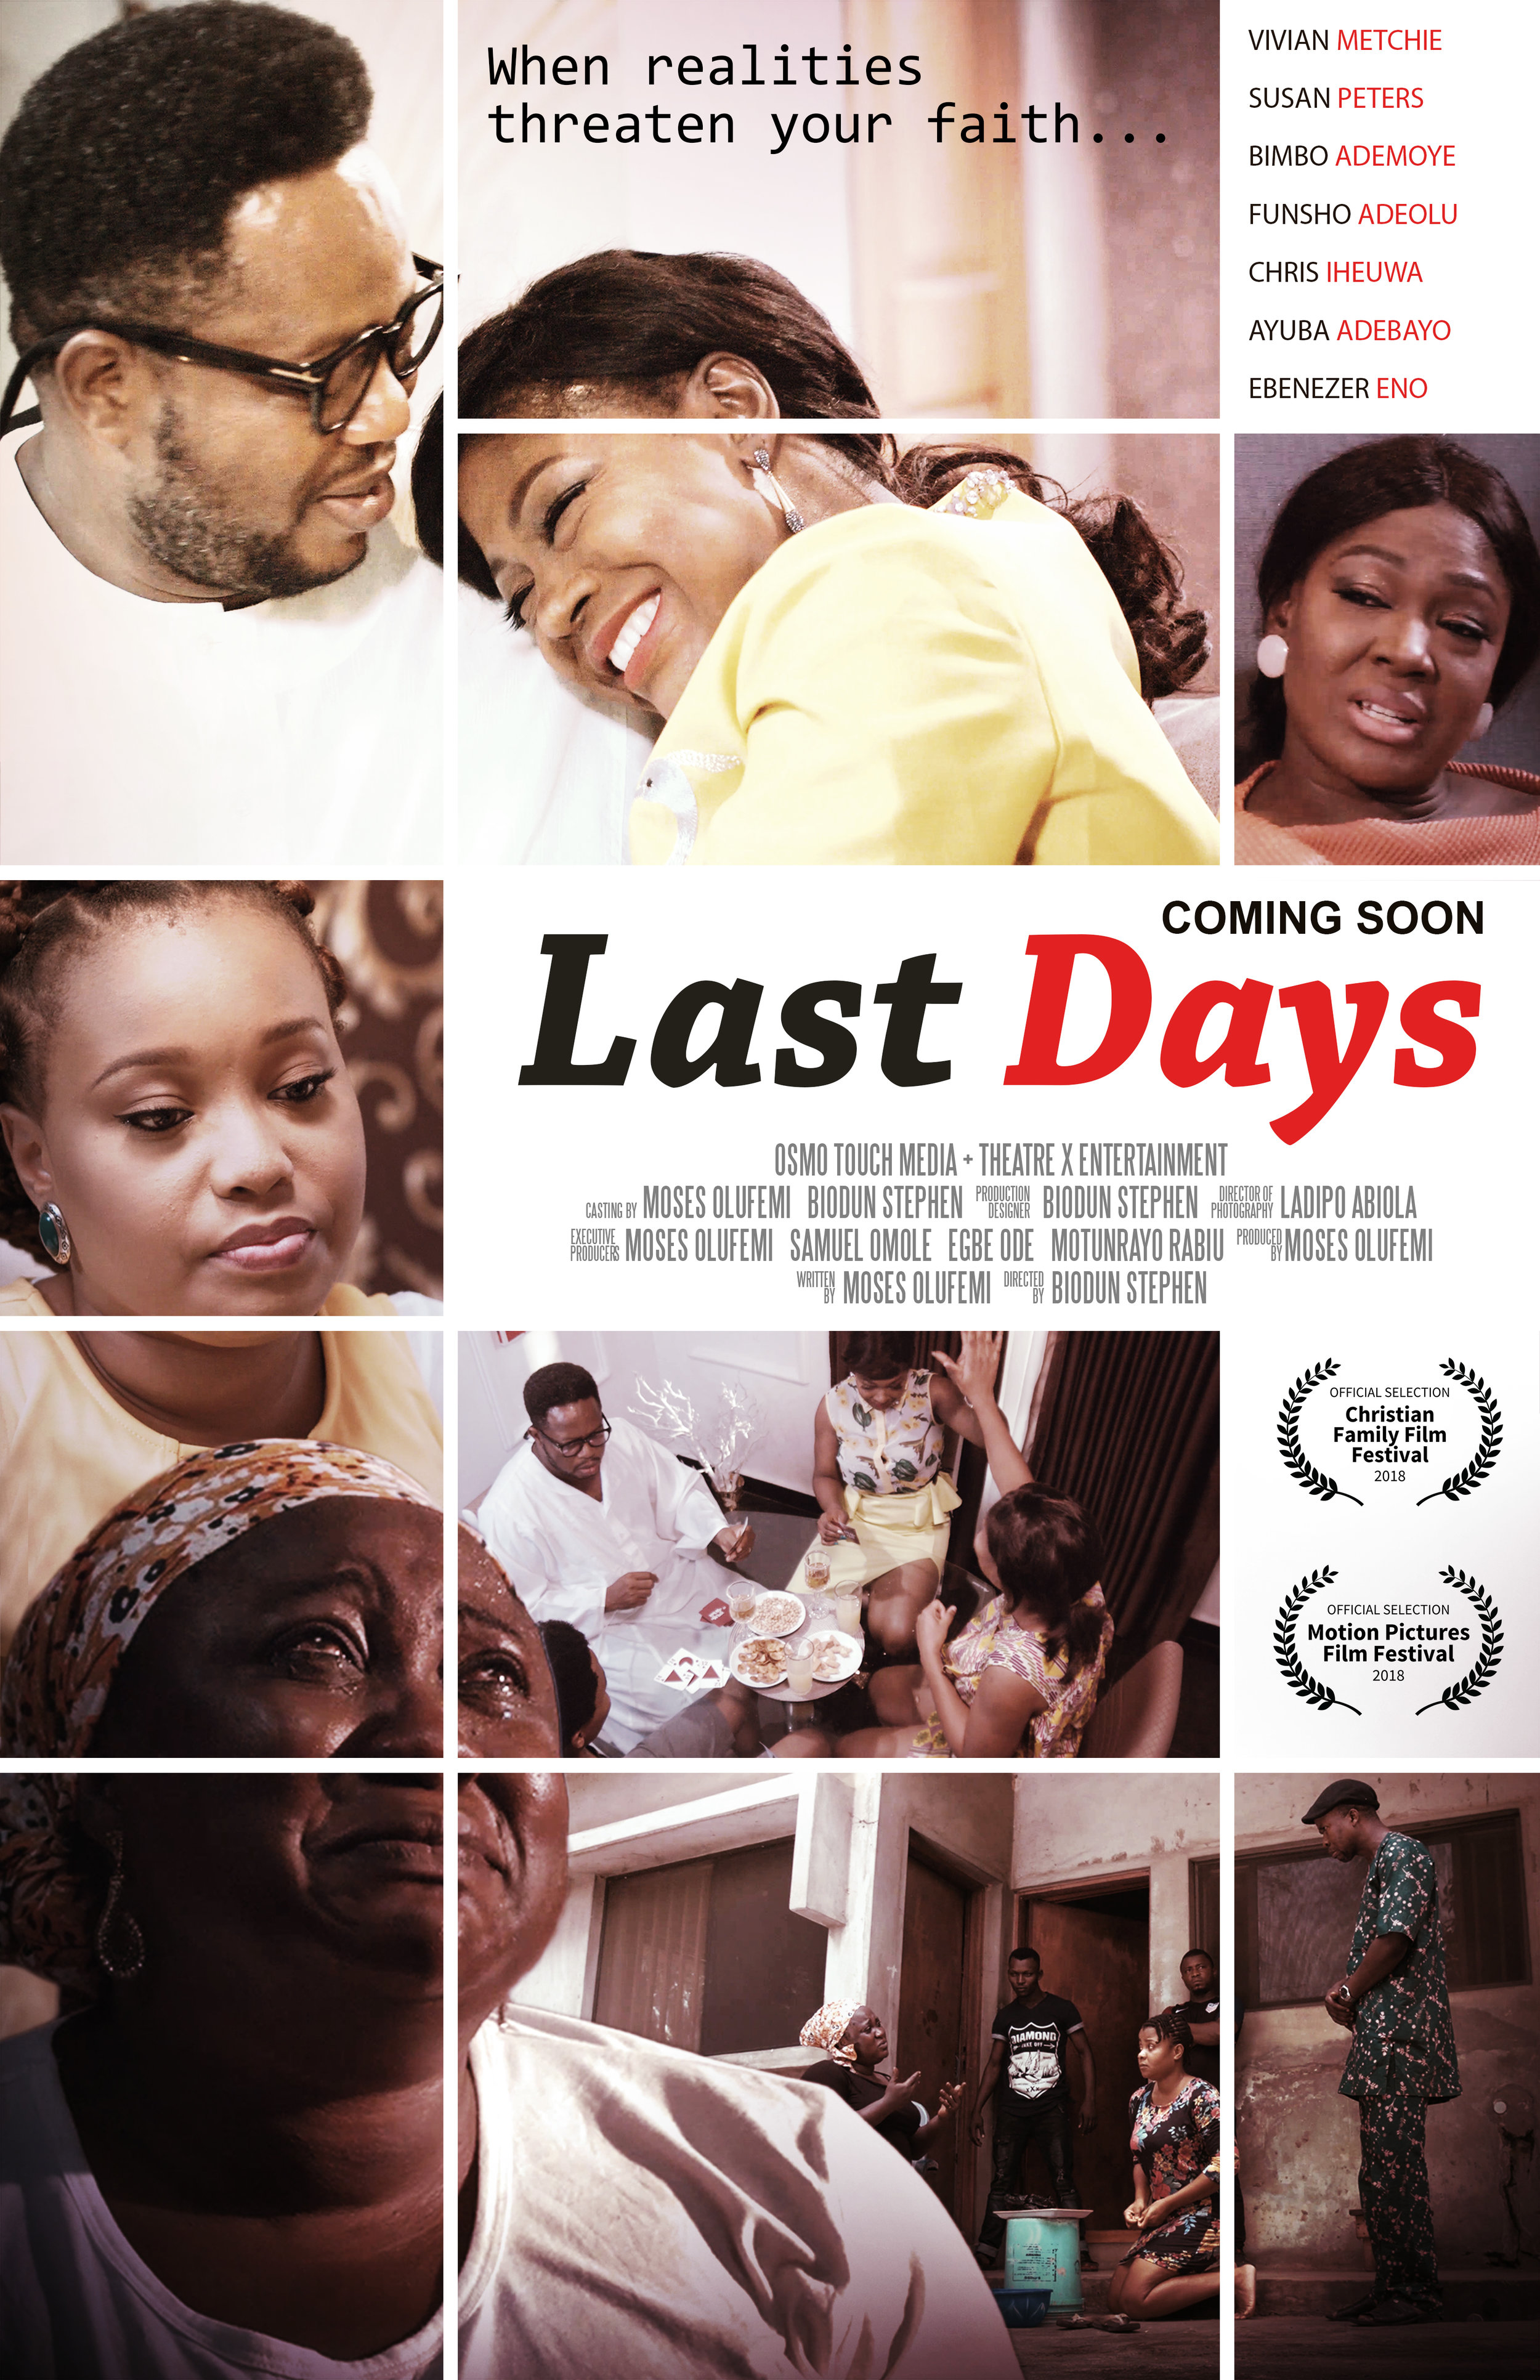 Last Days Poster.jpg